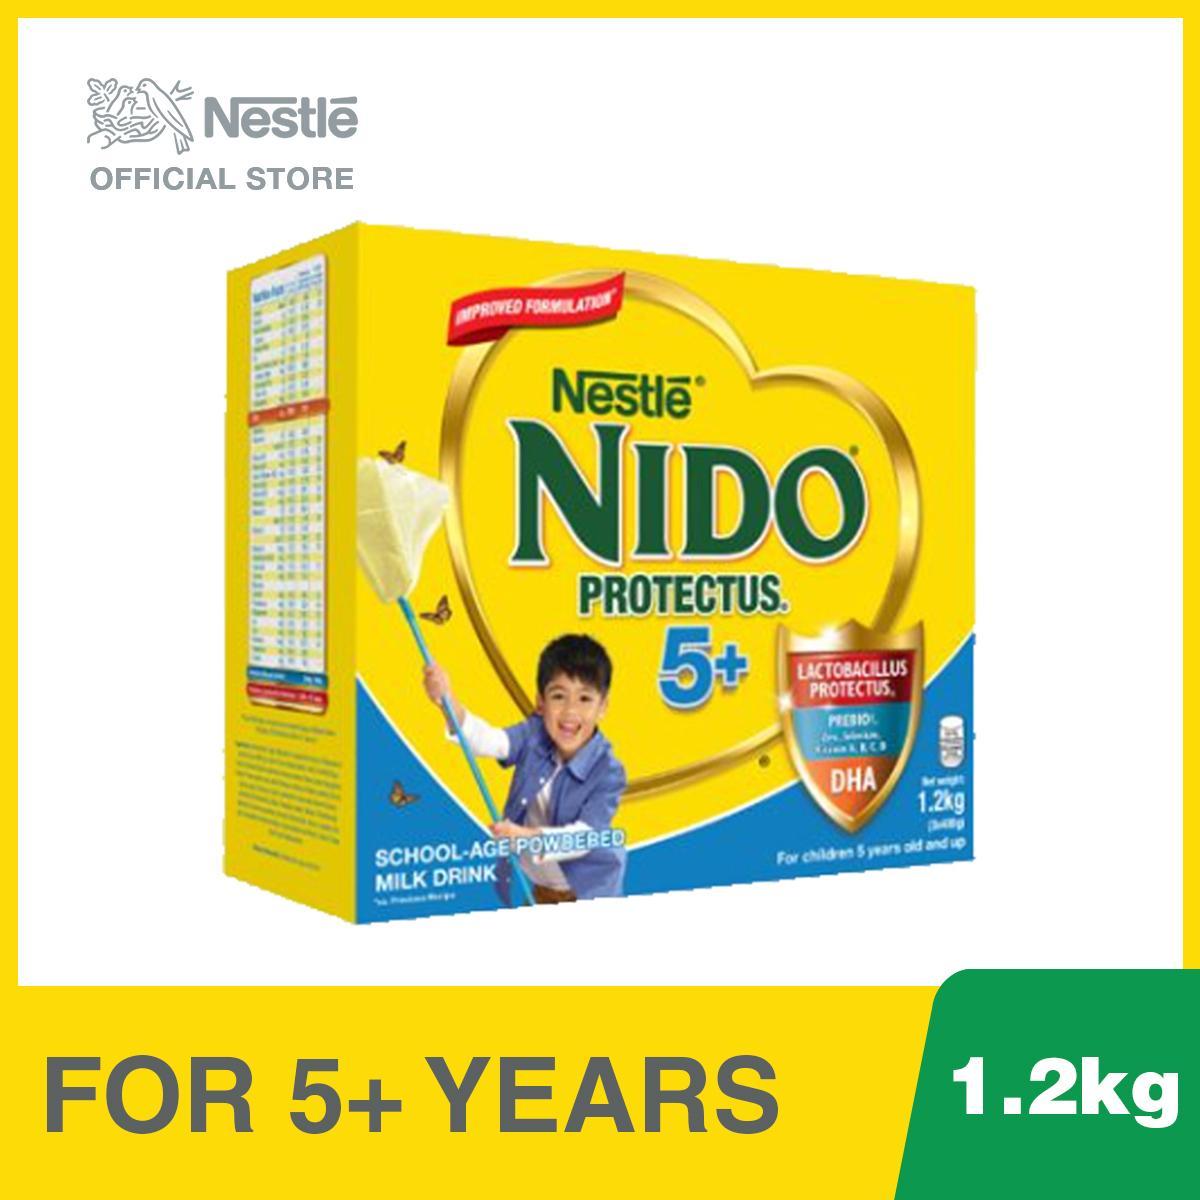 Promotions & Catalogs - Nestle Nido 5+ - School-Age Powdered